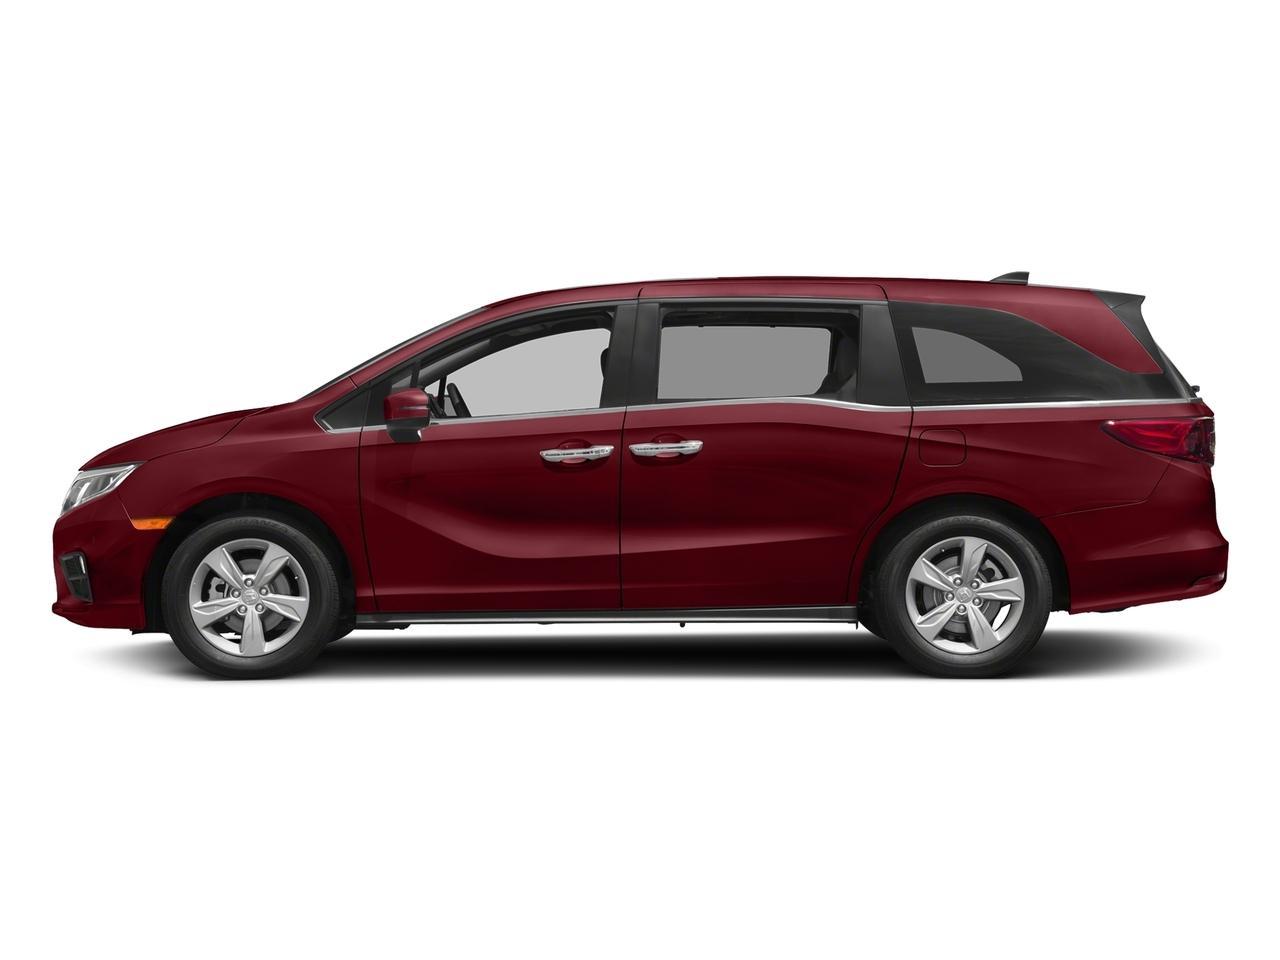 Used 2018 Honda Odyssey EX-L with VIN 5FNRL6H77JB074909 for sale in Willmar, Minnesota